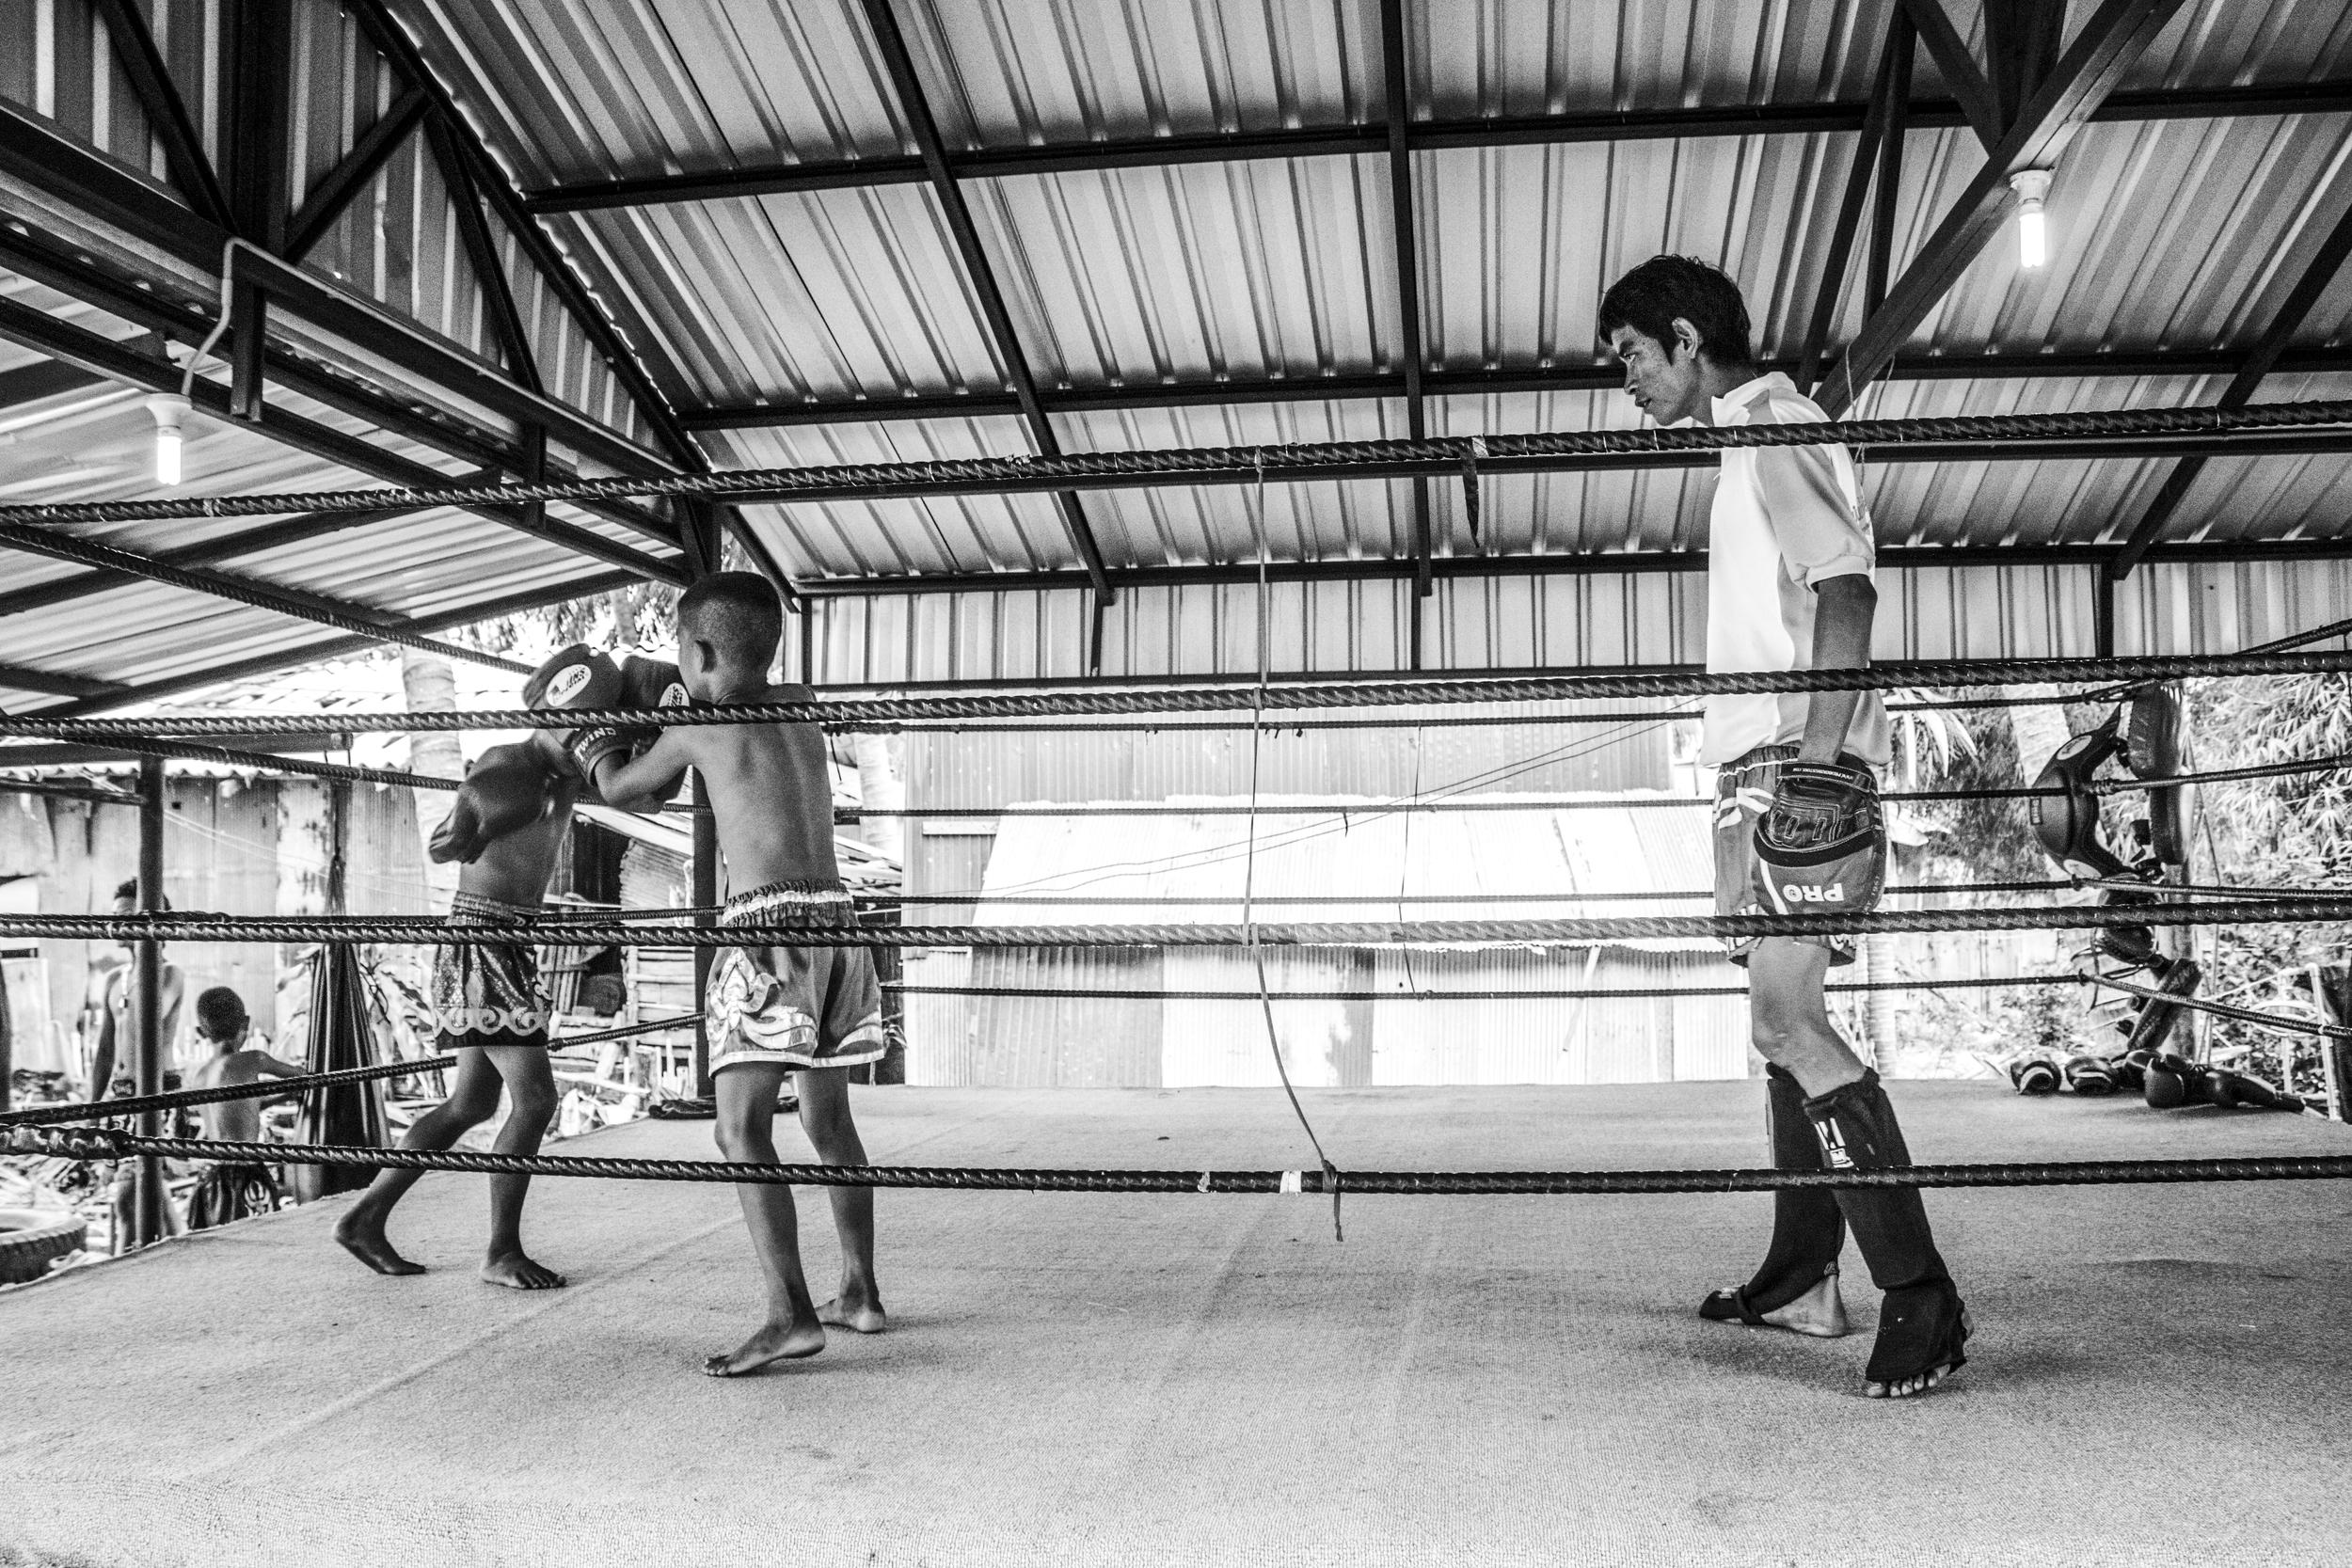 Watch & Learn (July 11, 2014 - Tha Sala, Thailand)